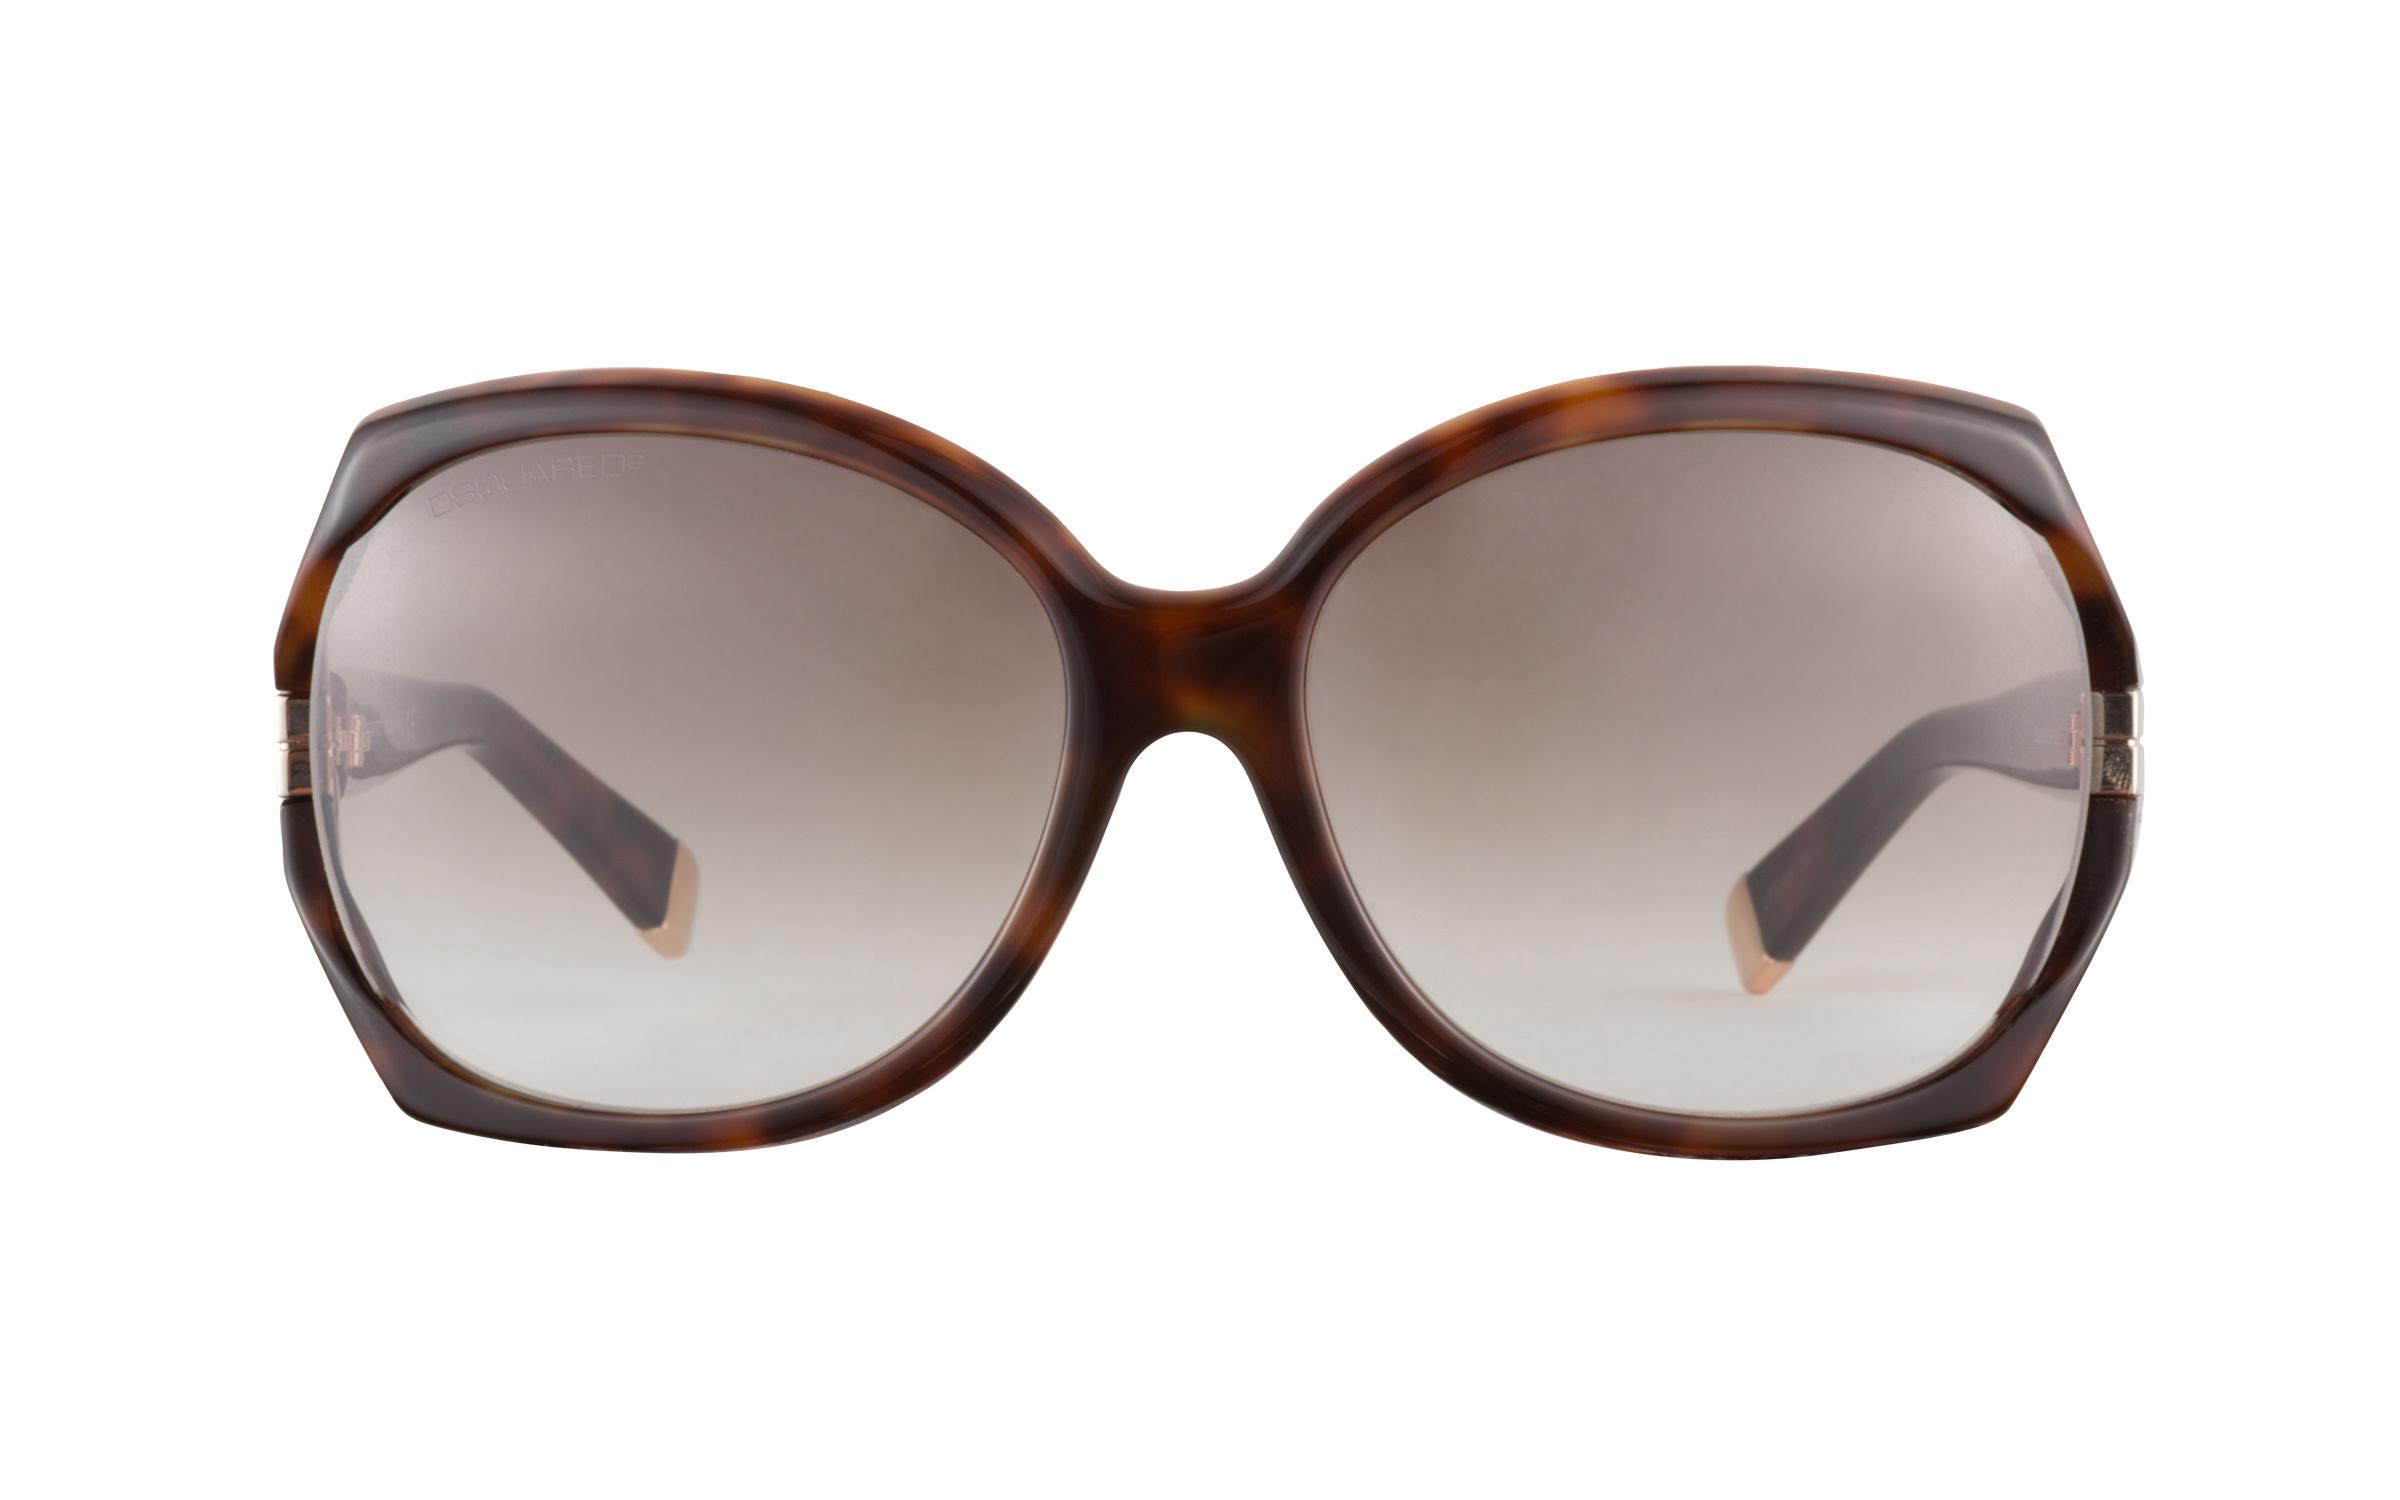 Dsquared_Sunglasses_Oversized_Tortoise_PlasticMetal_Online_Coastal